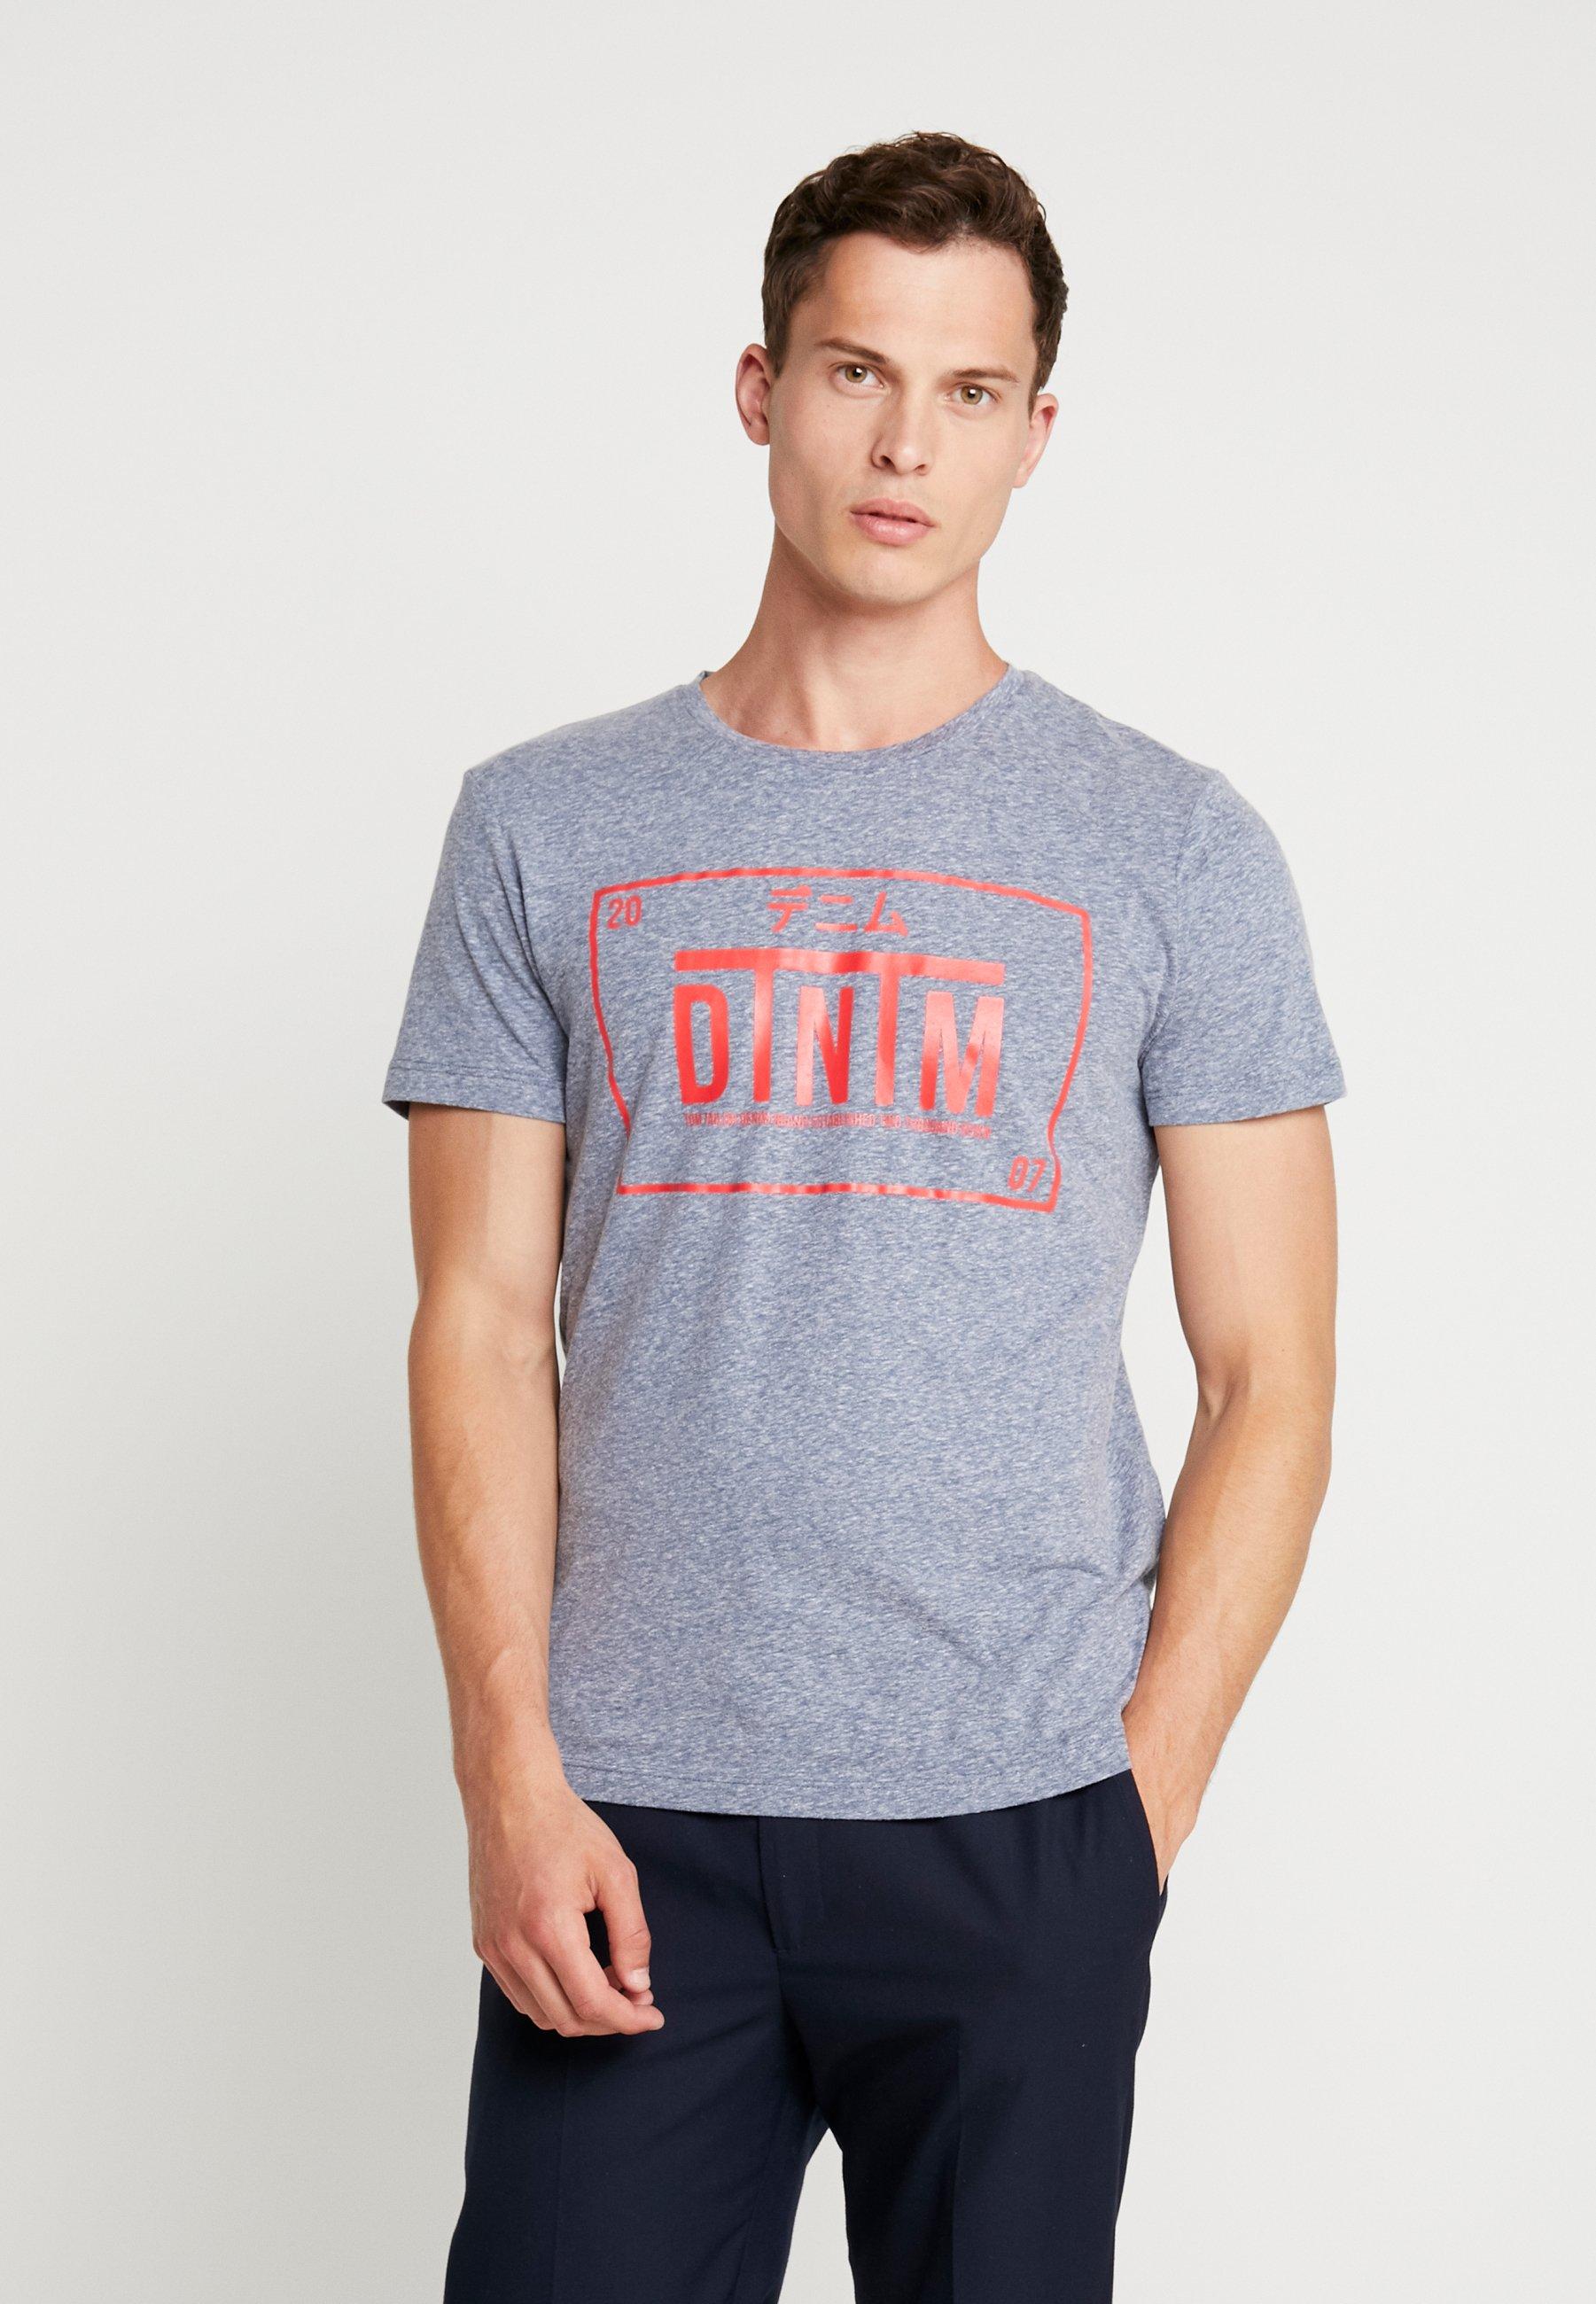 shirt T Stone Tom Denim ImpriméAgate Blue Melange Tailor EHeW2YbD9I